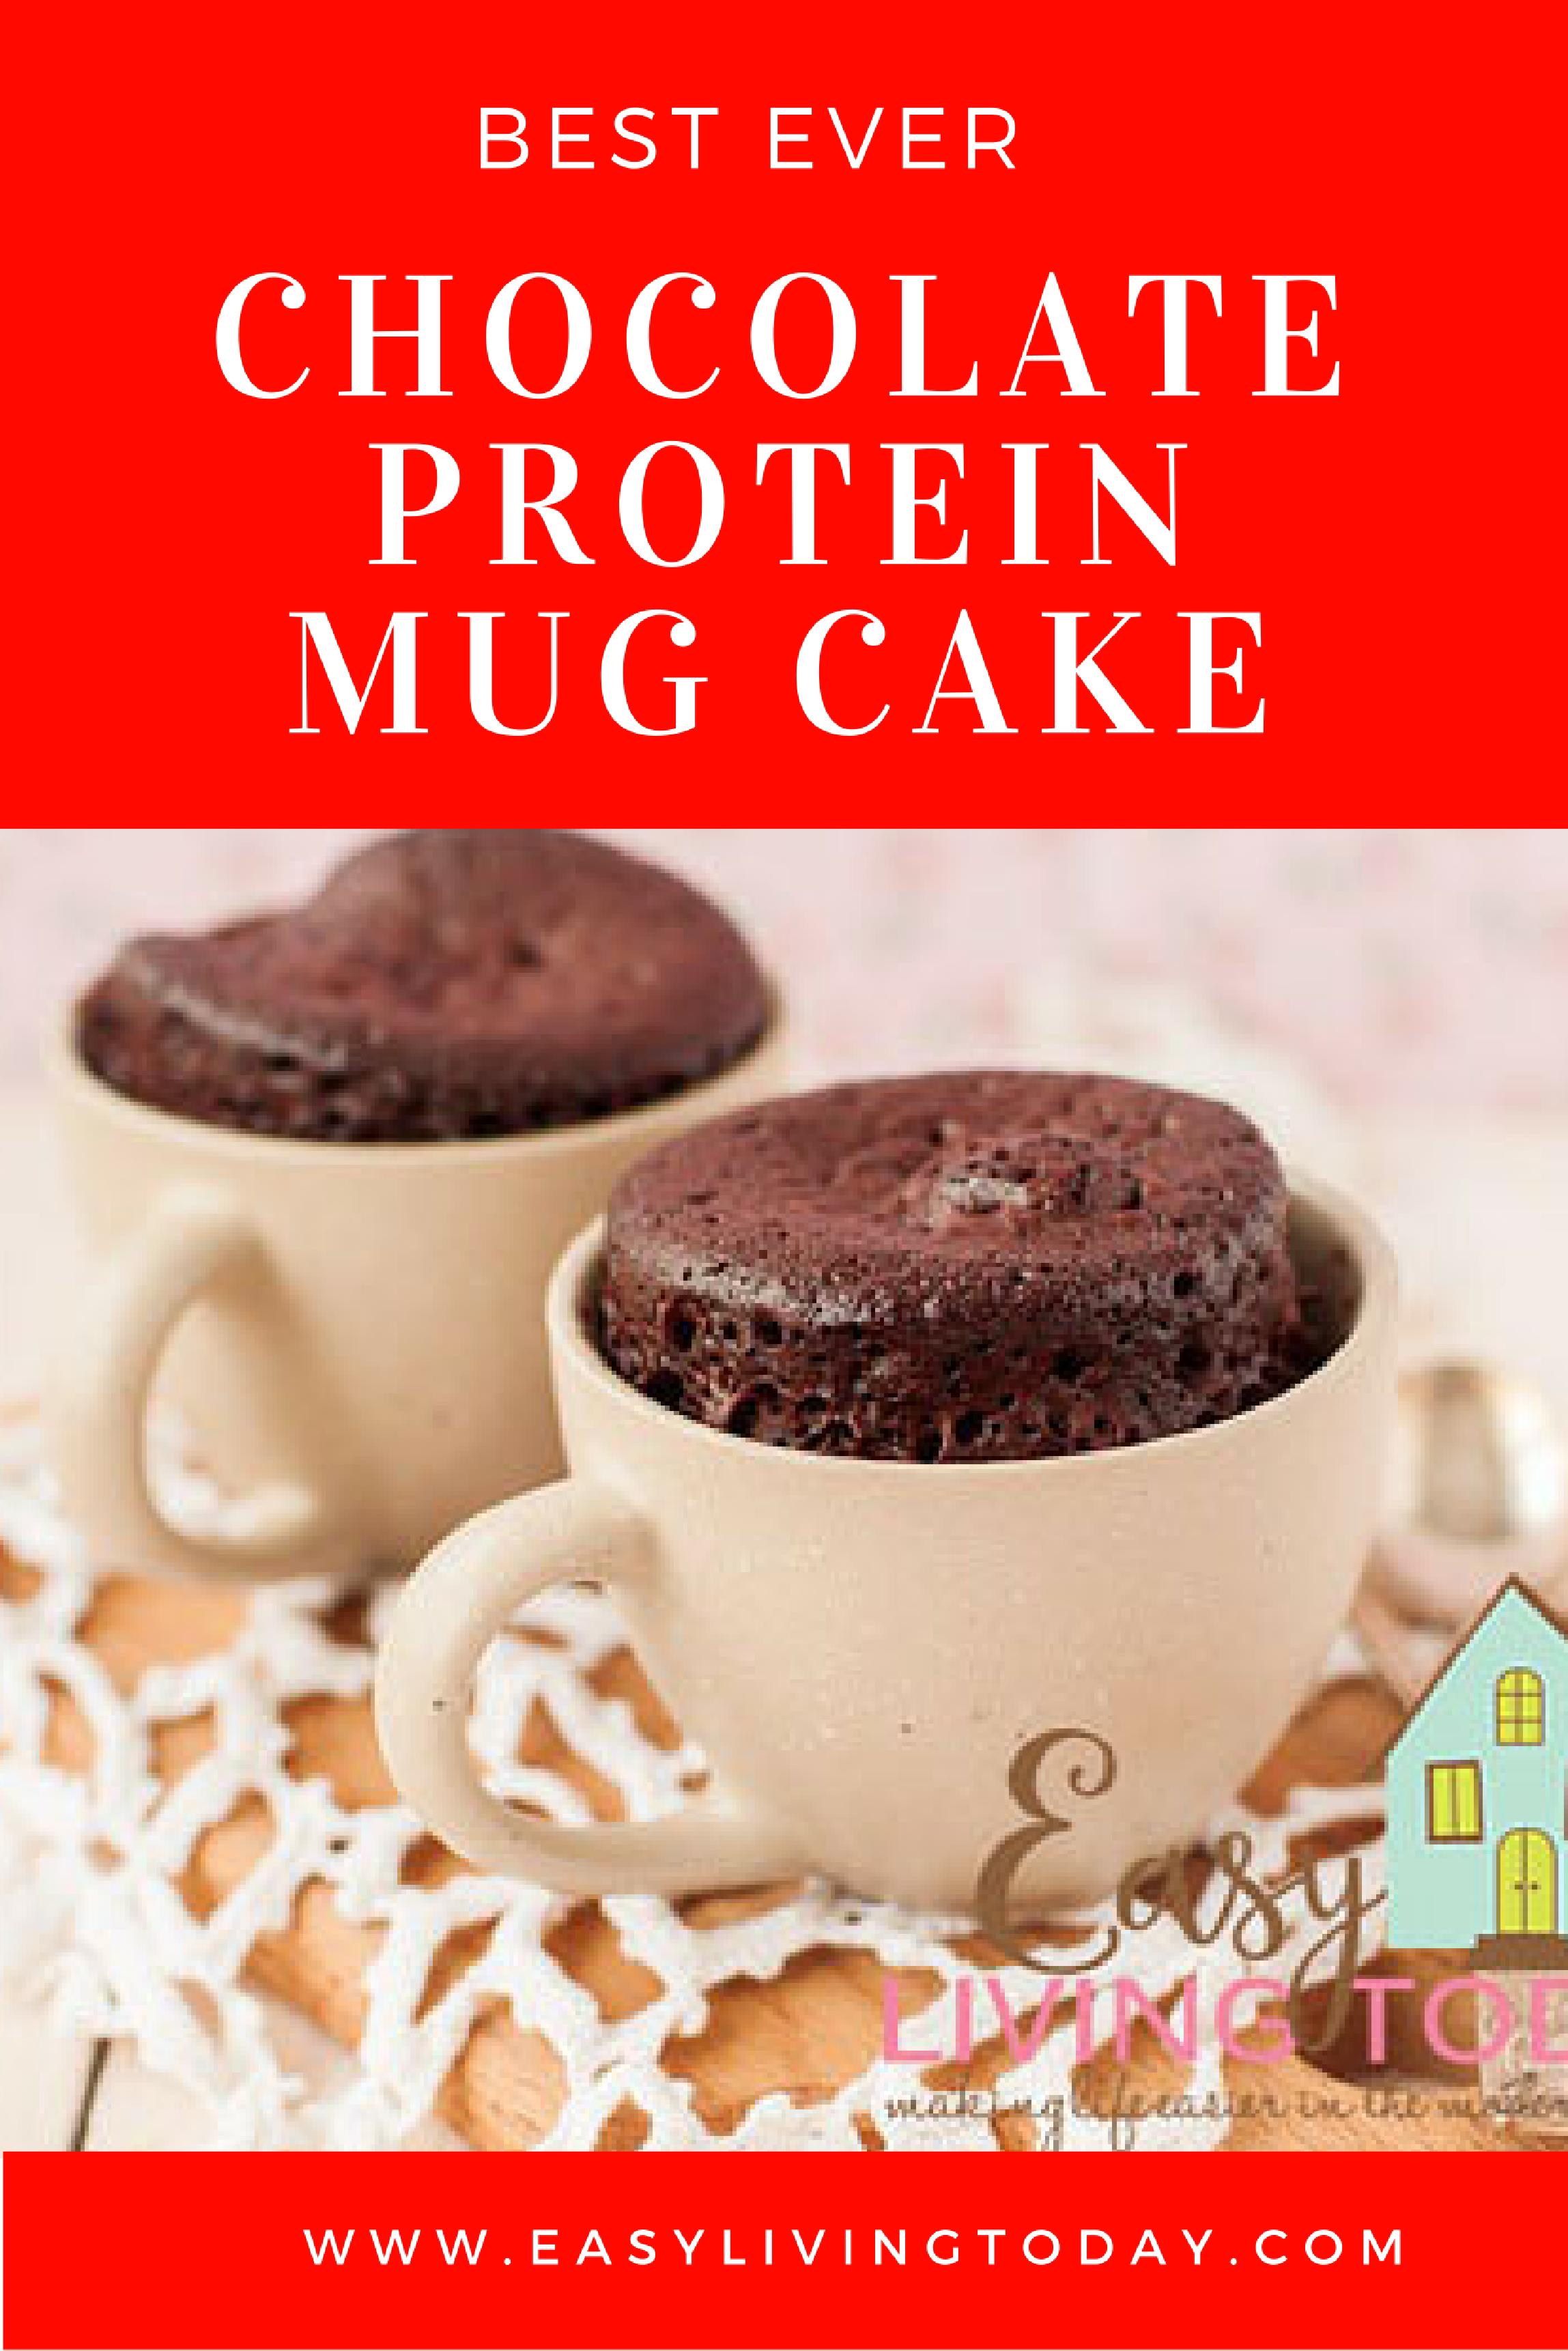 Best Ever Chocolate Protein Powder Mug Cake Recipe for Clean Eating #proteinmugcakes